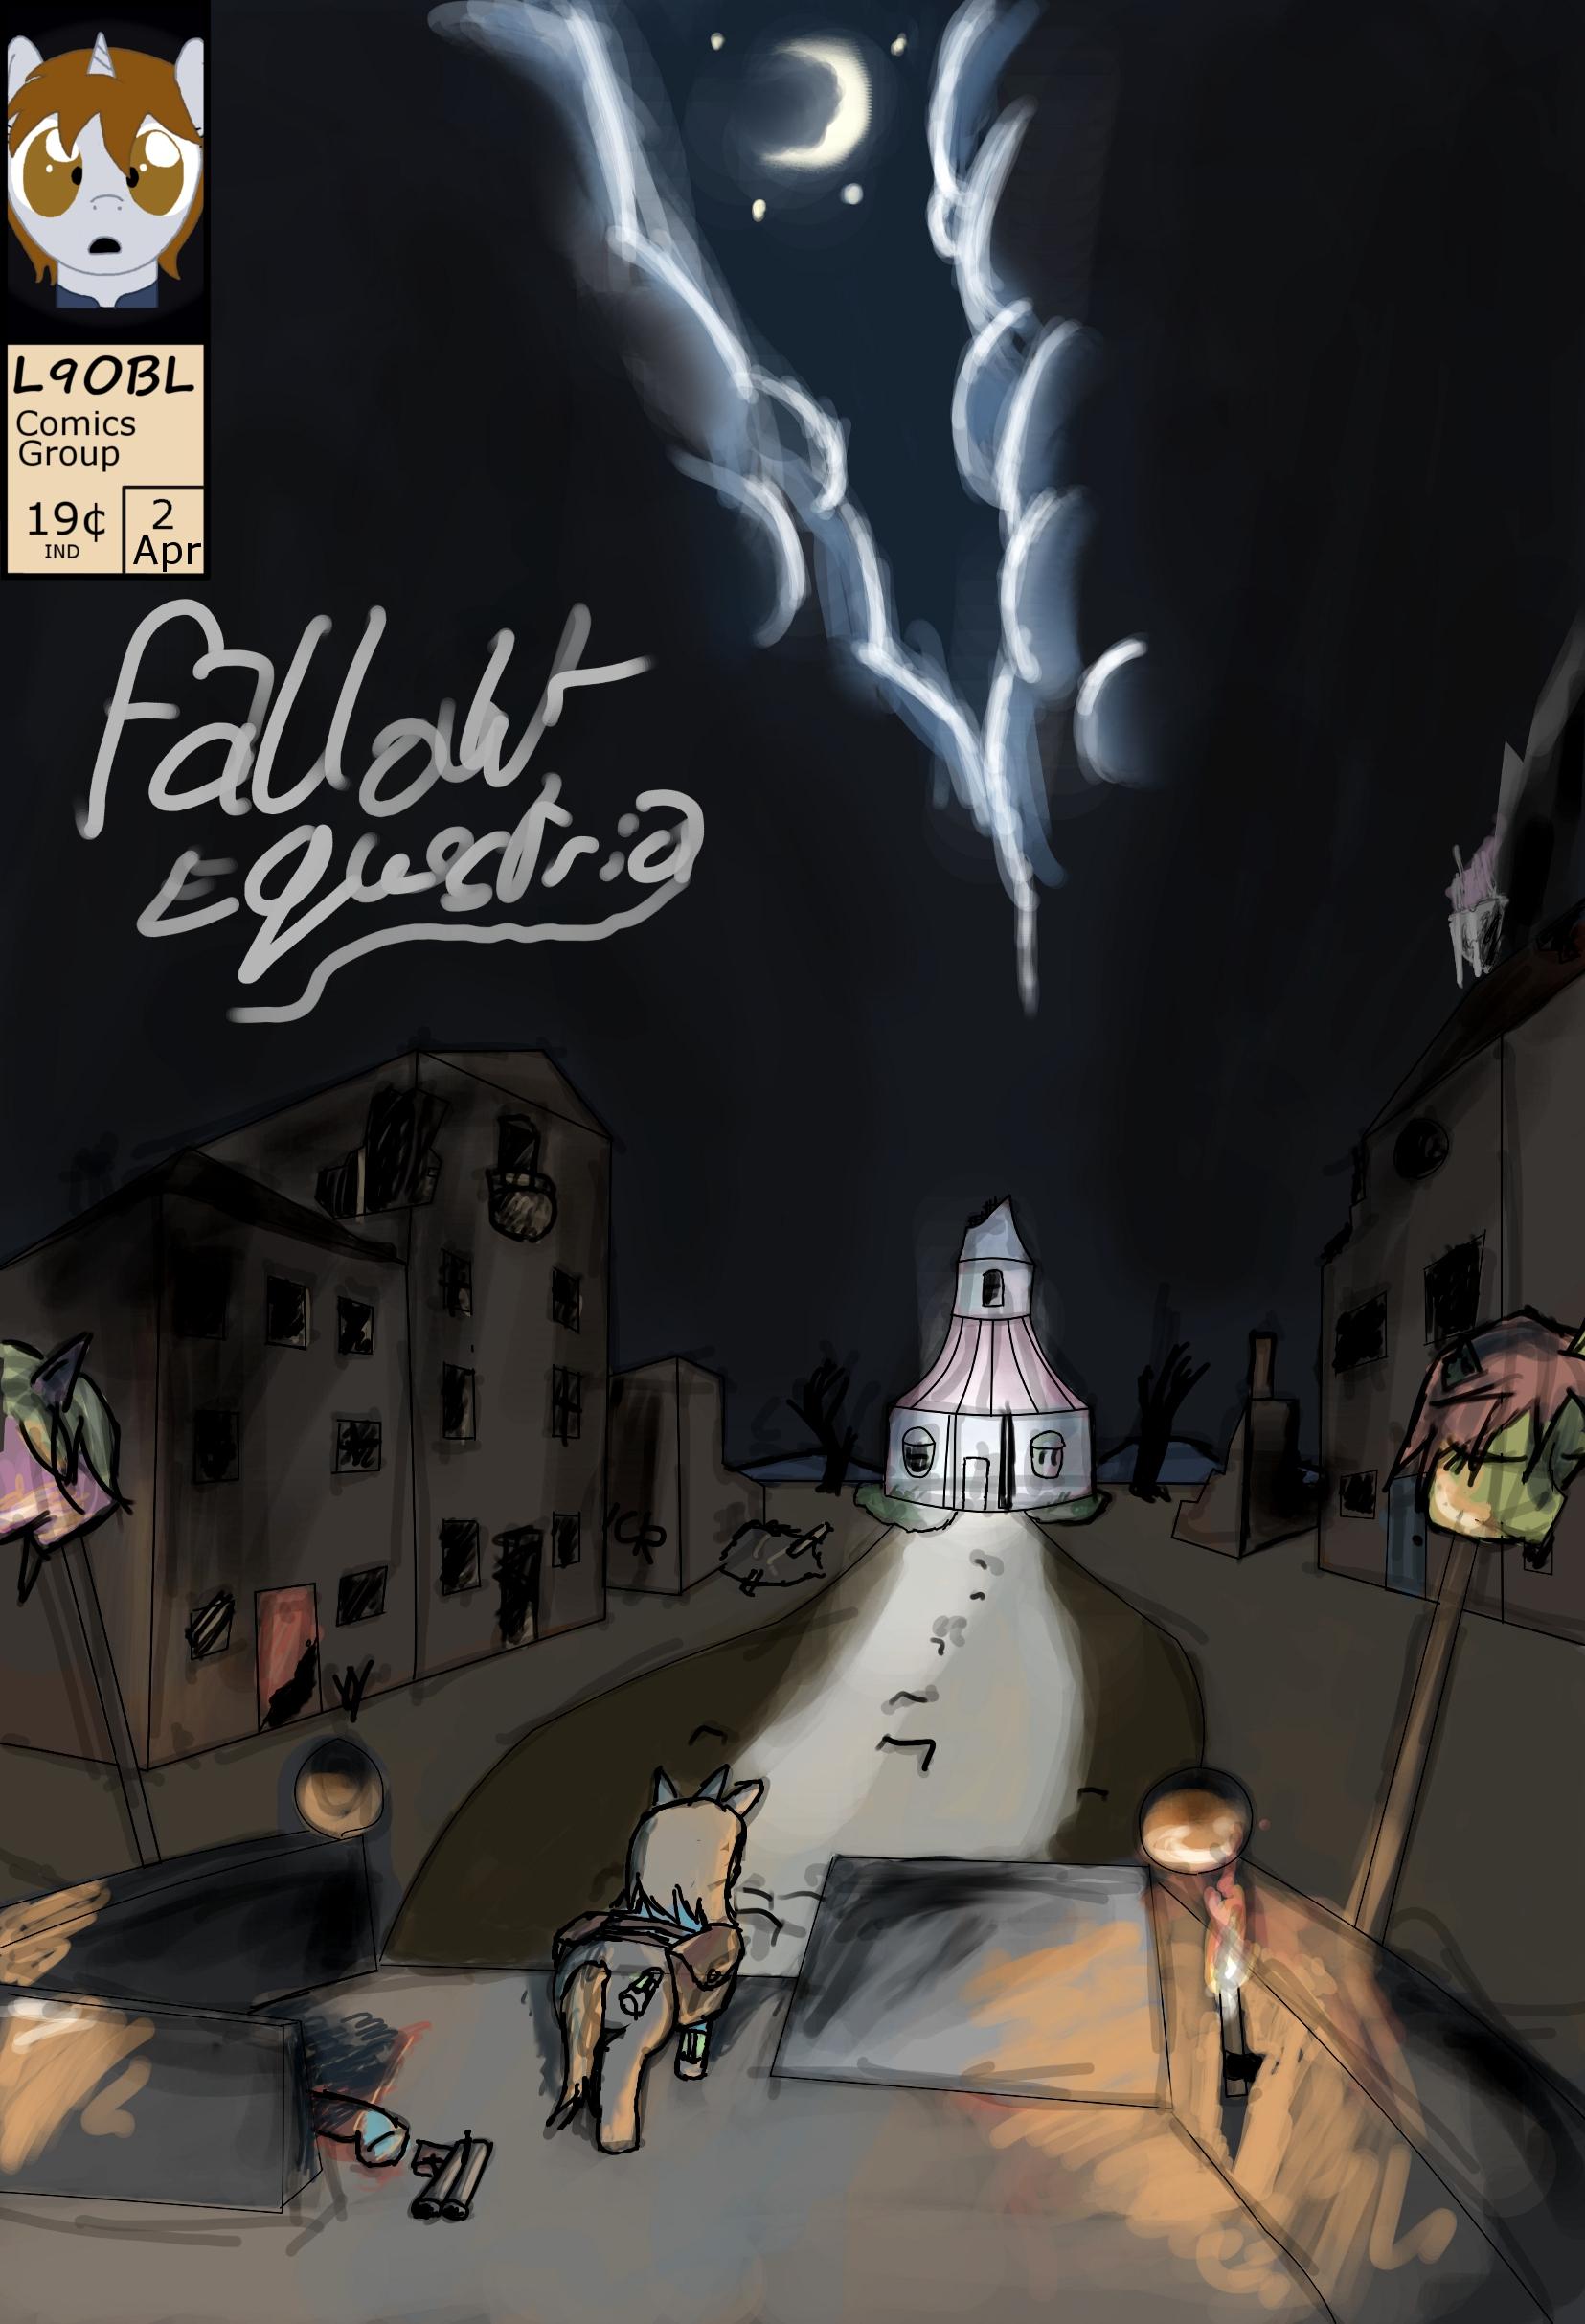 Fallout Equestria: The Hand Drawn Comic Issue 2